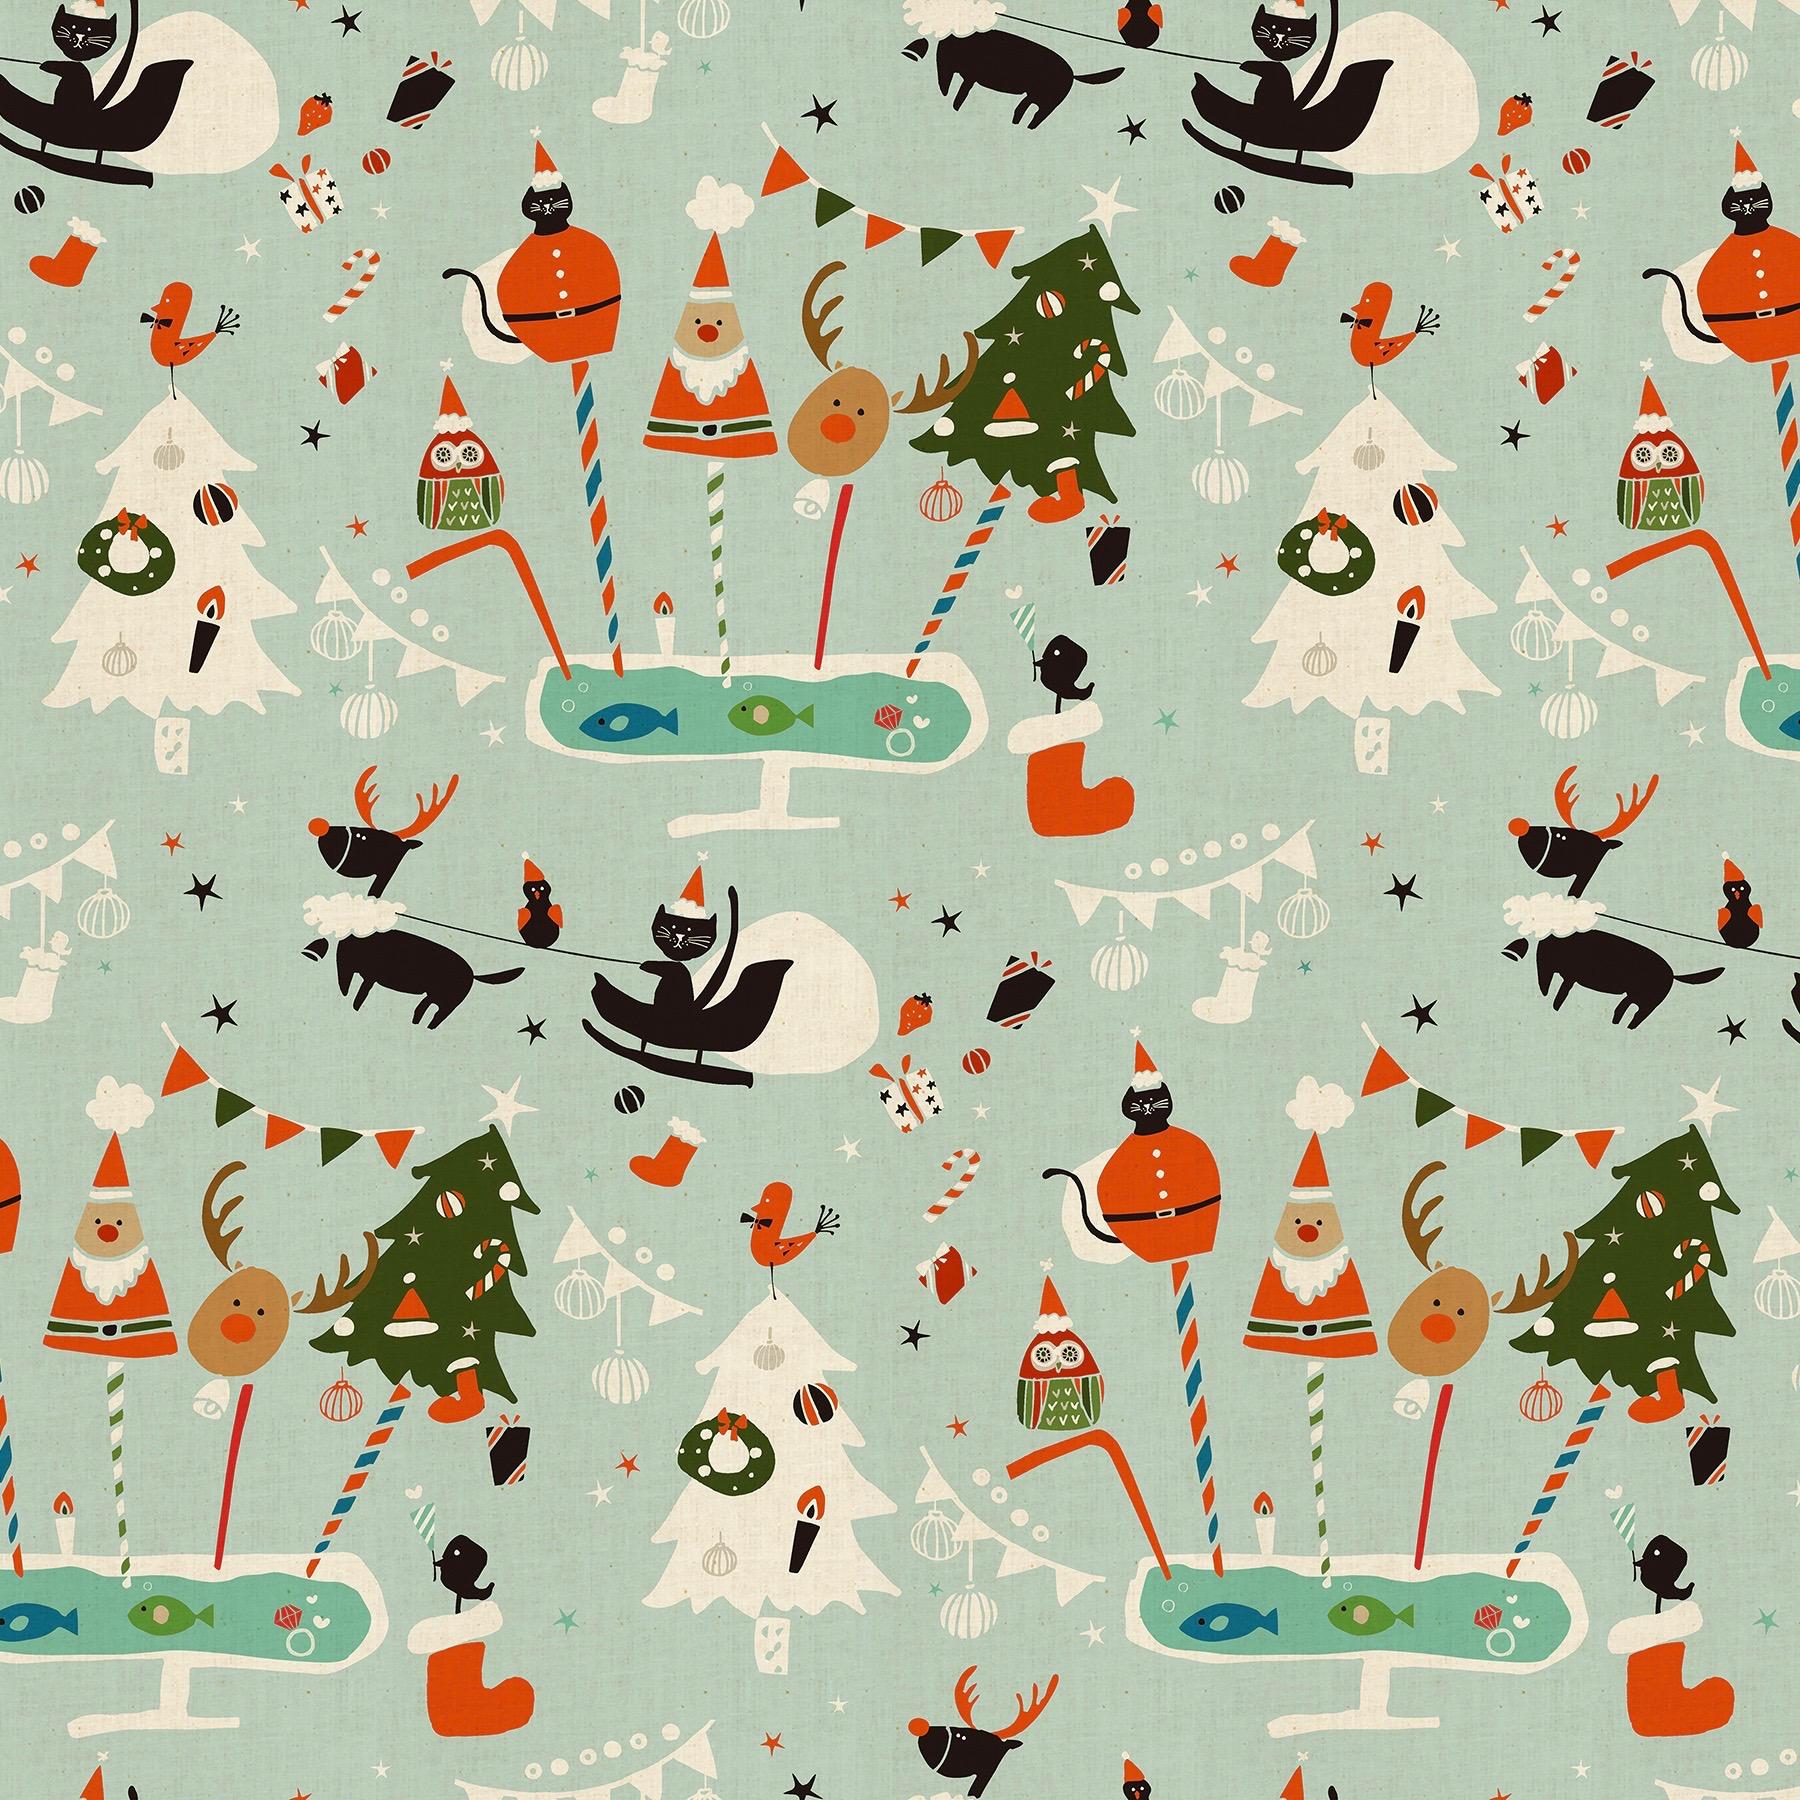 Cotton + Steel Waku Waku Christmas - Holiday Party (Aqua)